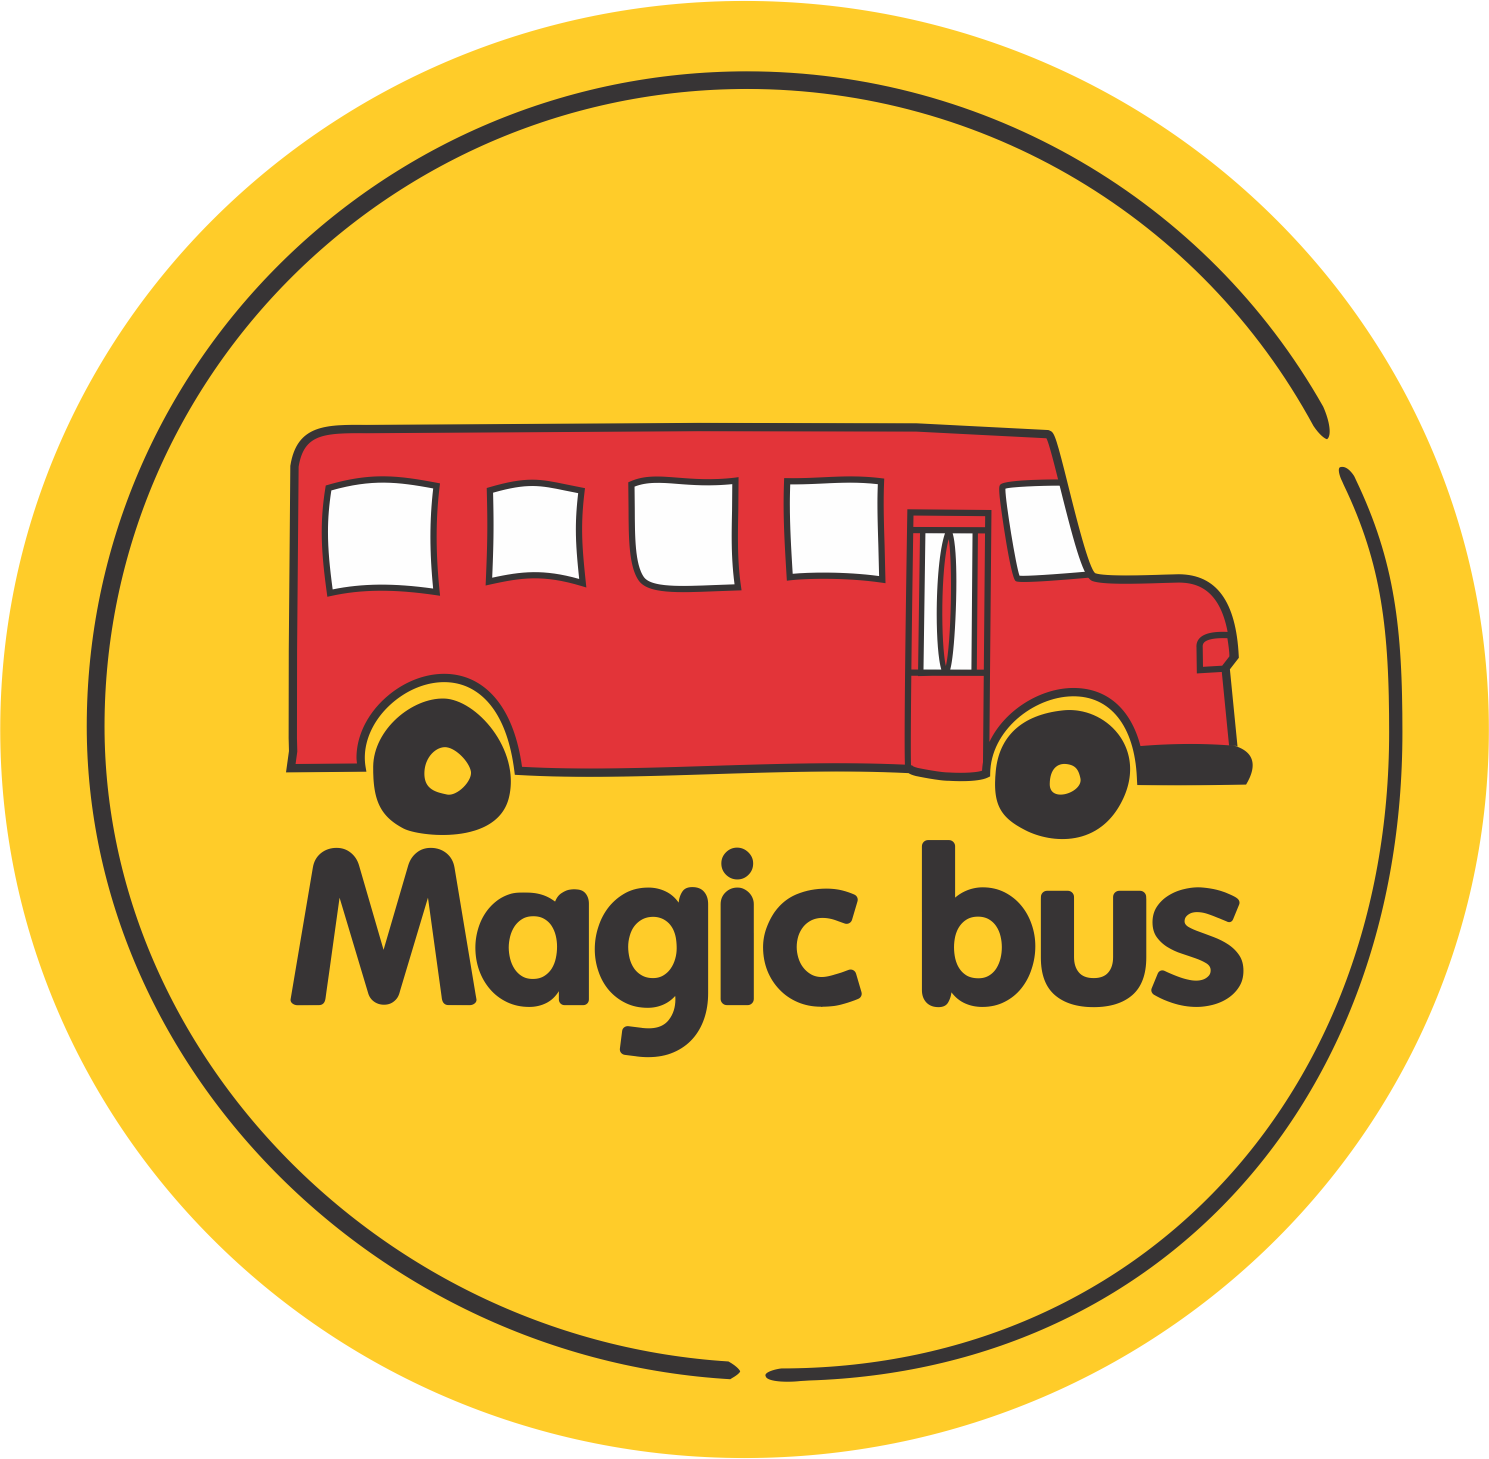 magicbuslogo.png